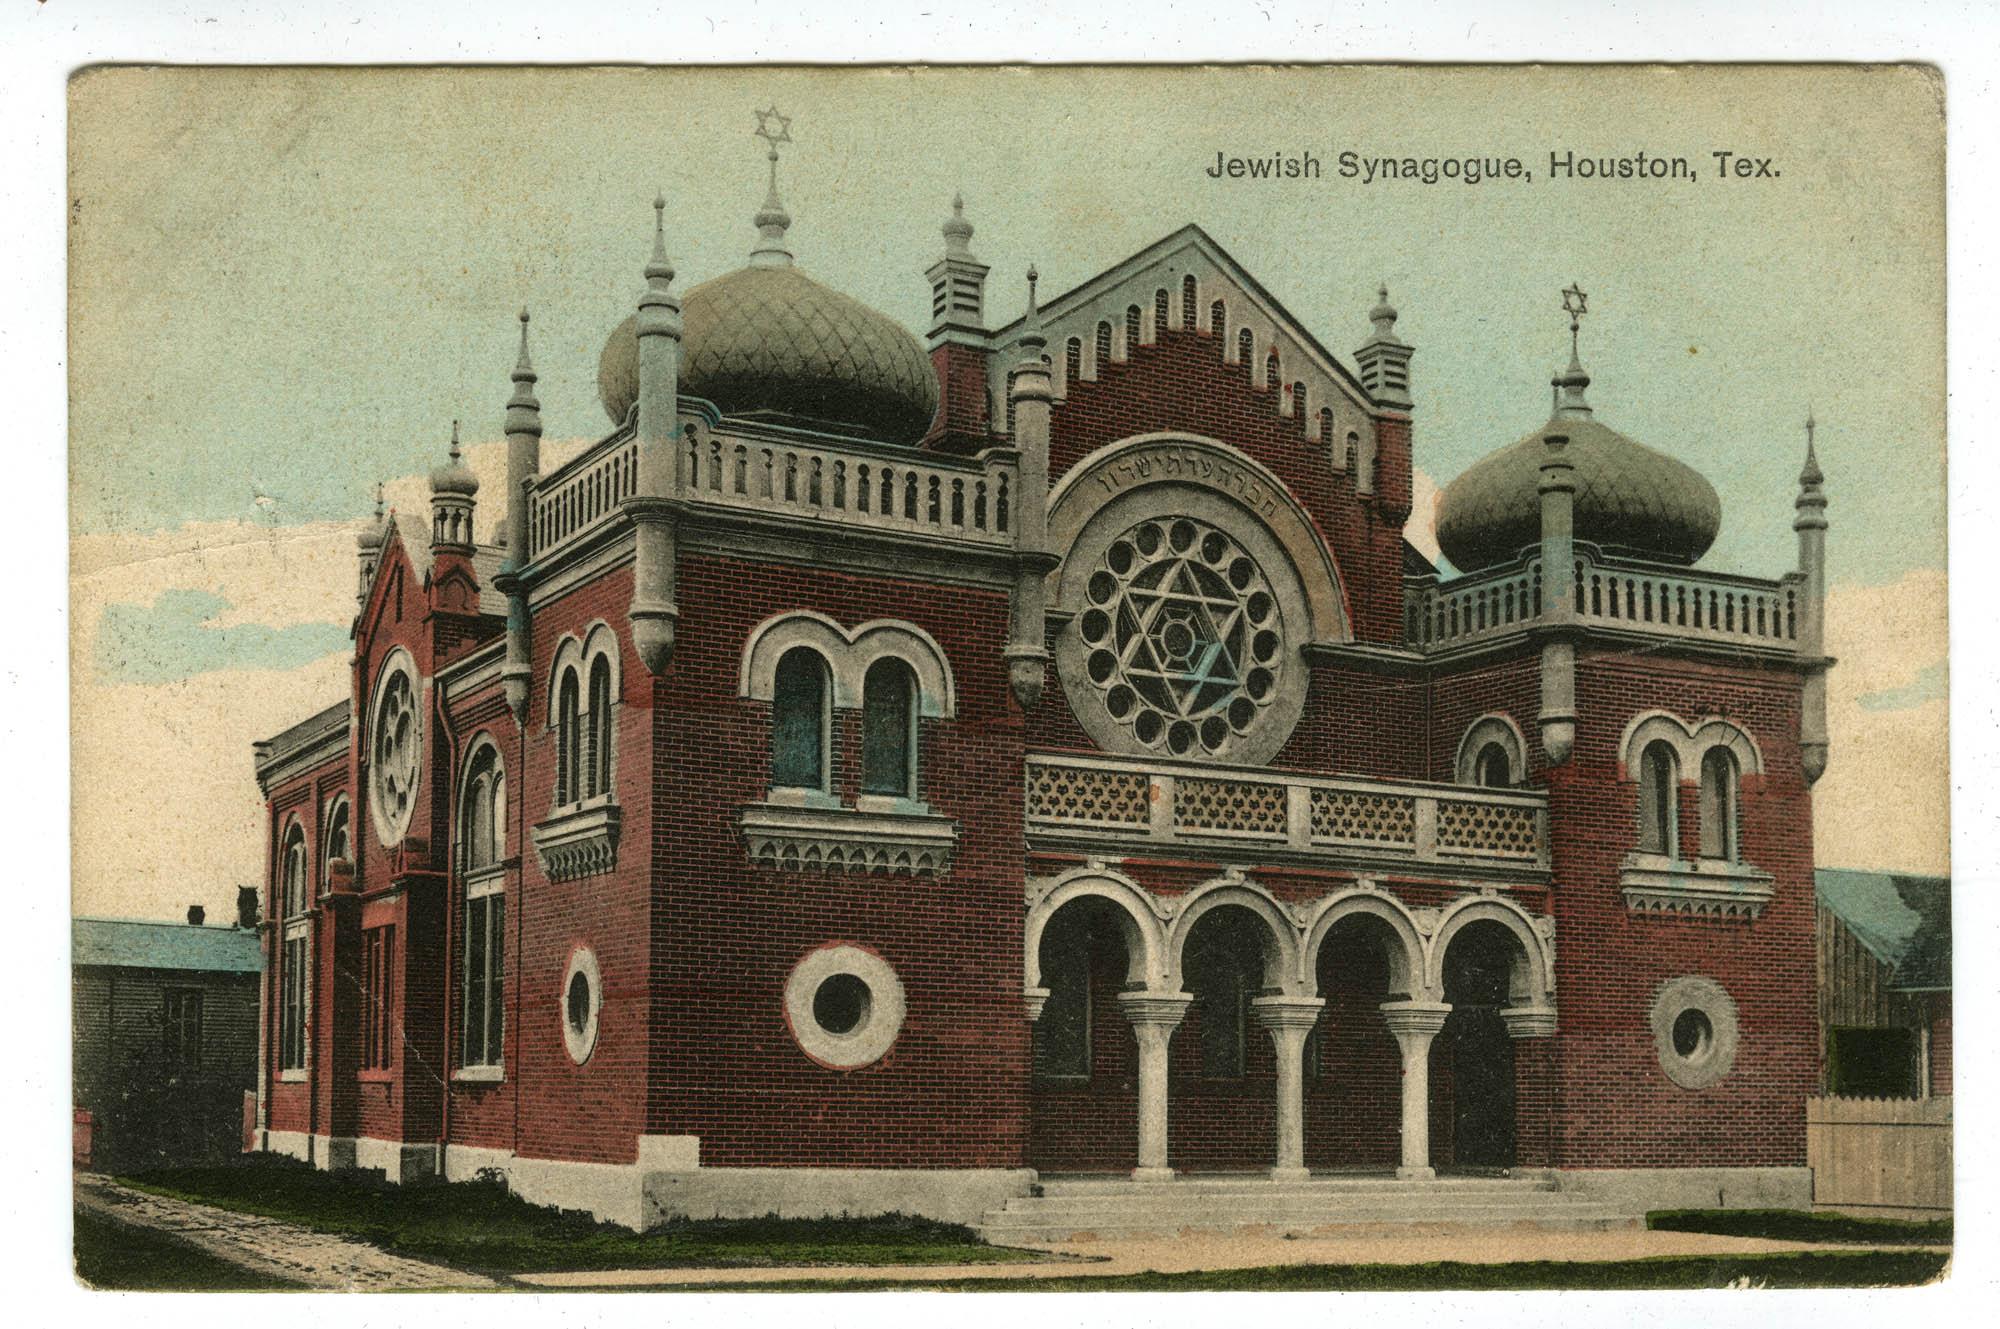 Jewish Synagogue, Houston, Tex.